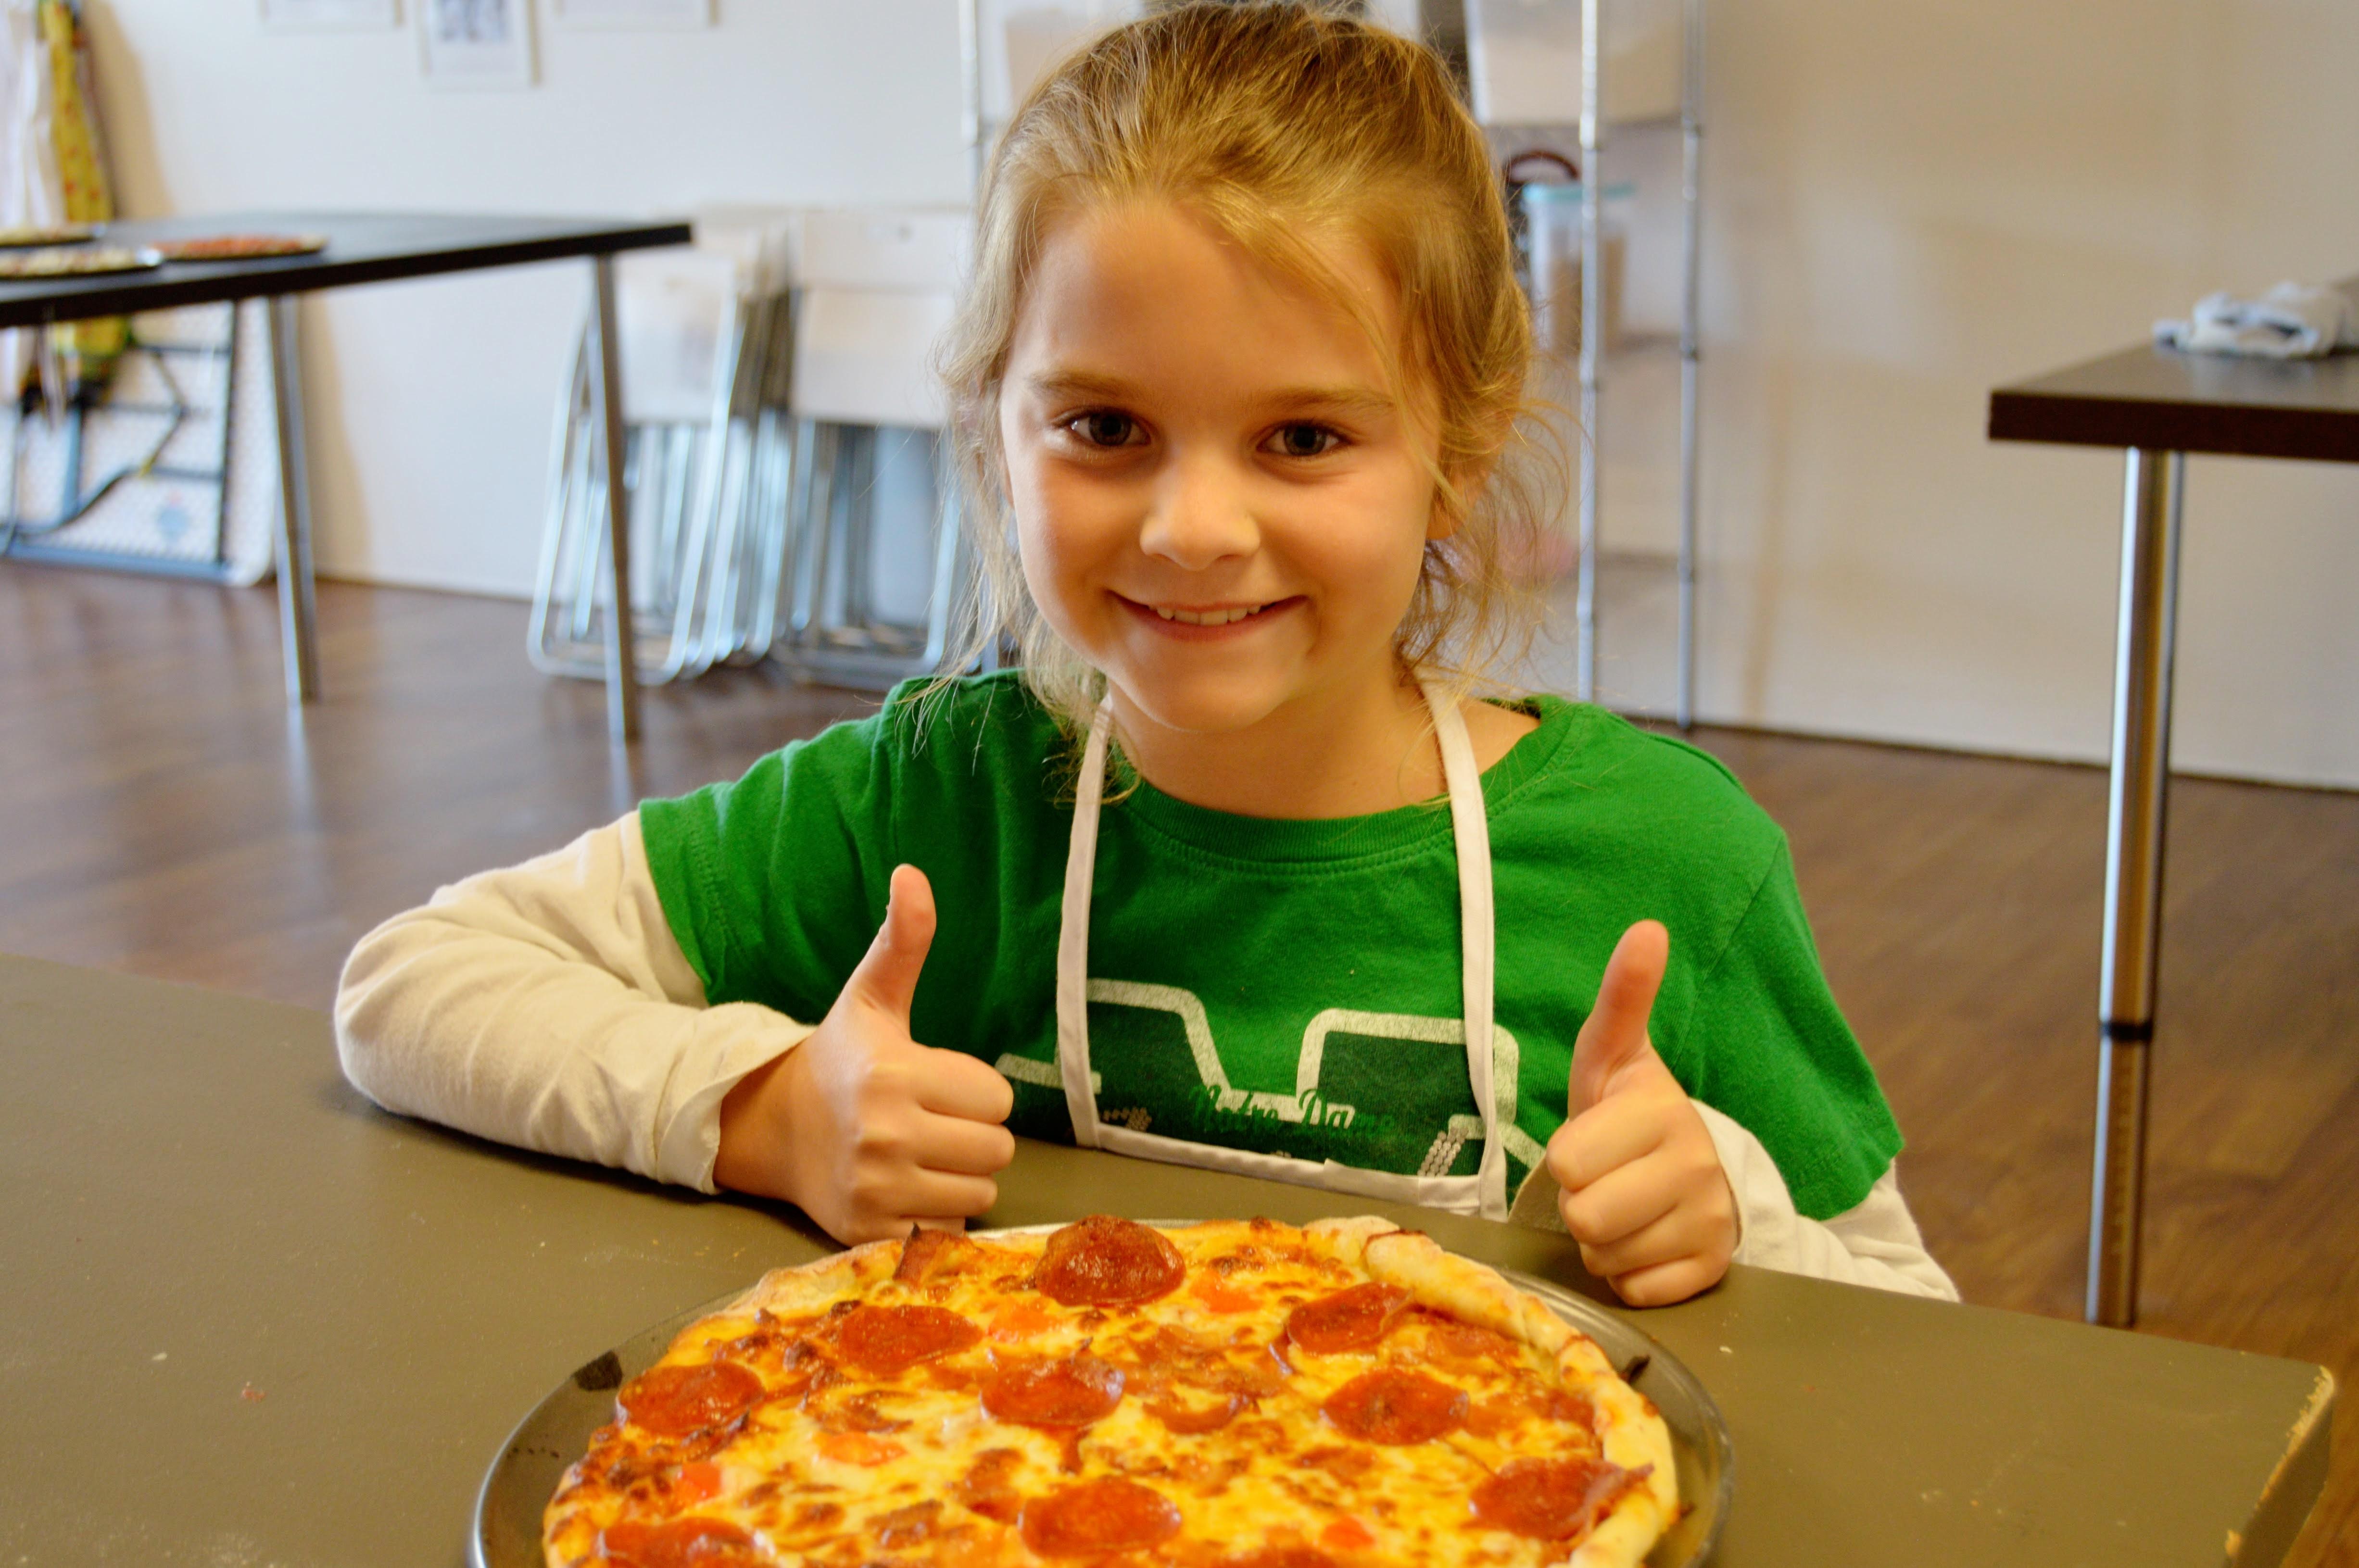 Pizza is ready at faronda davis